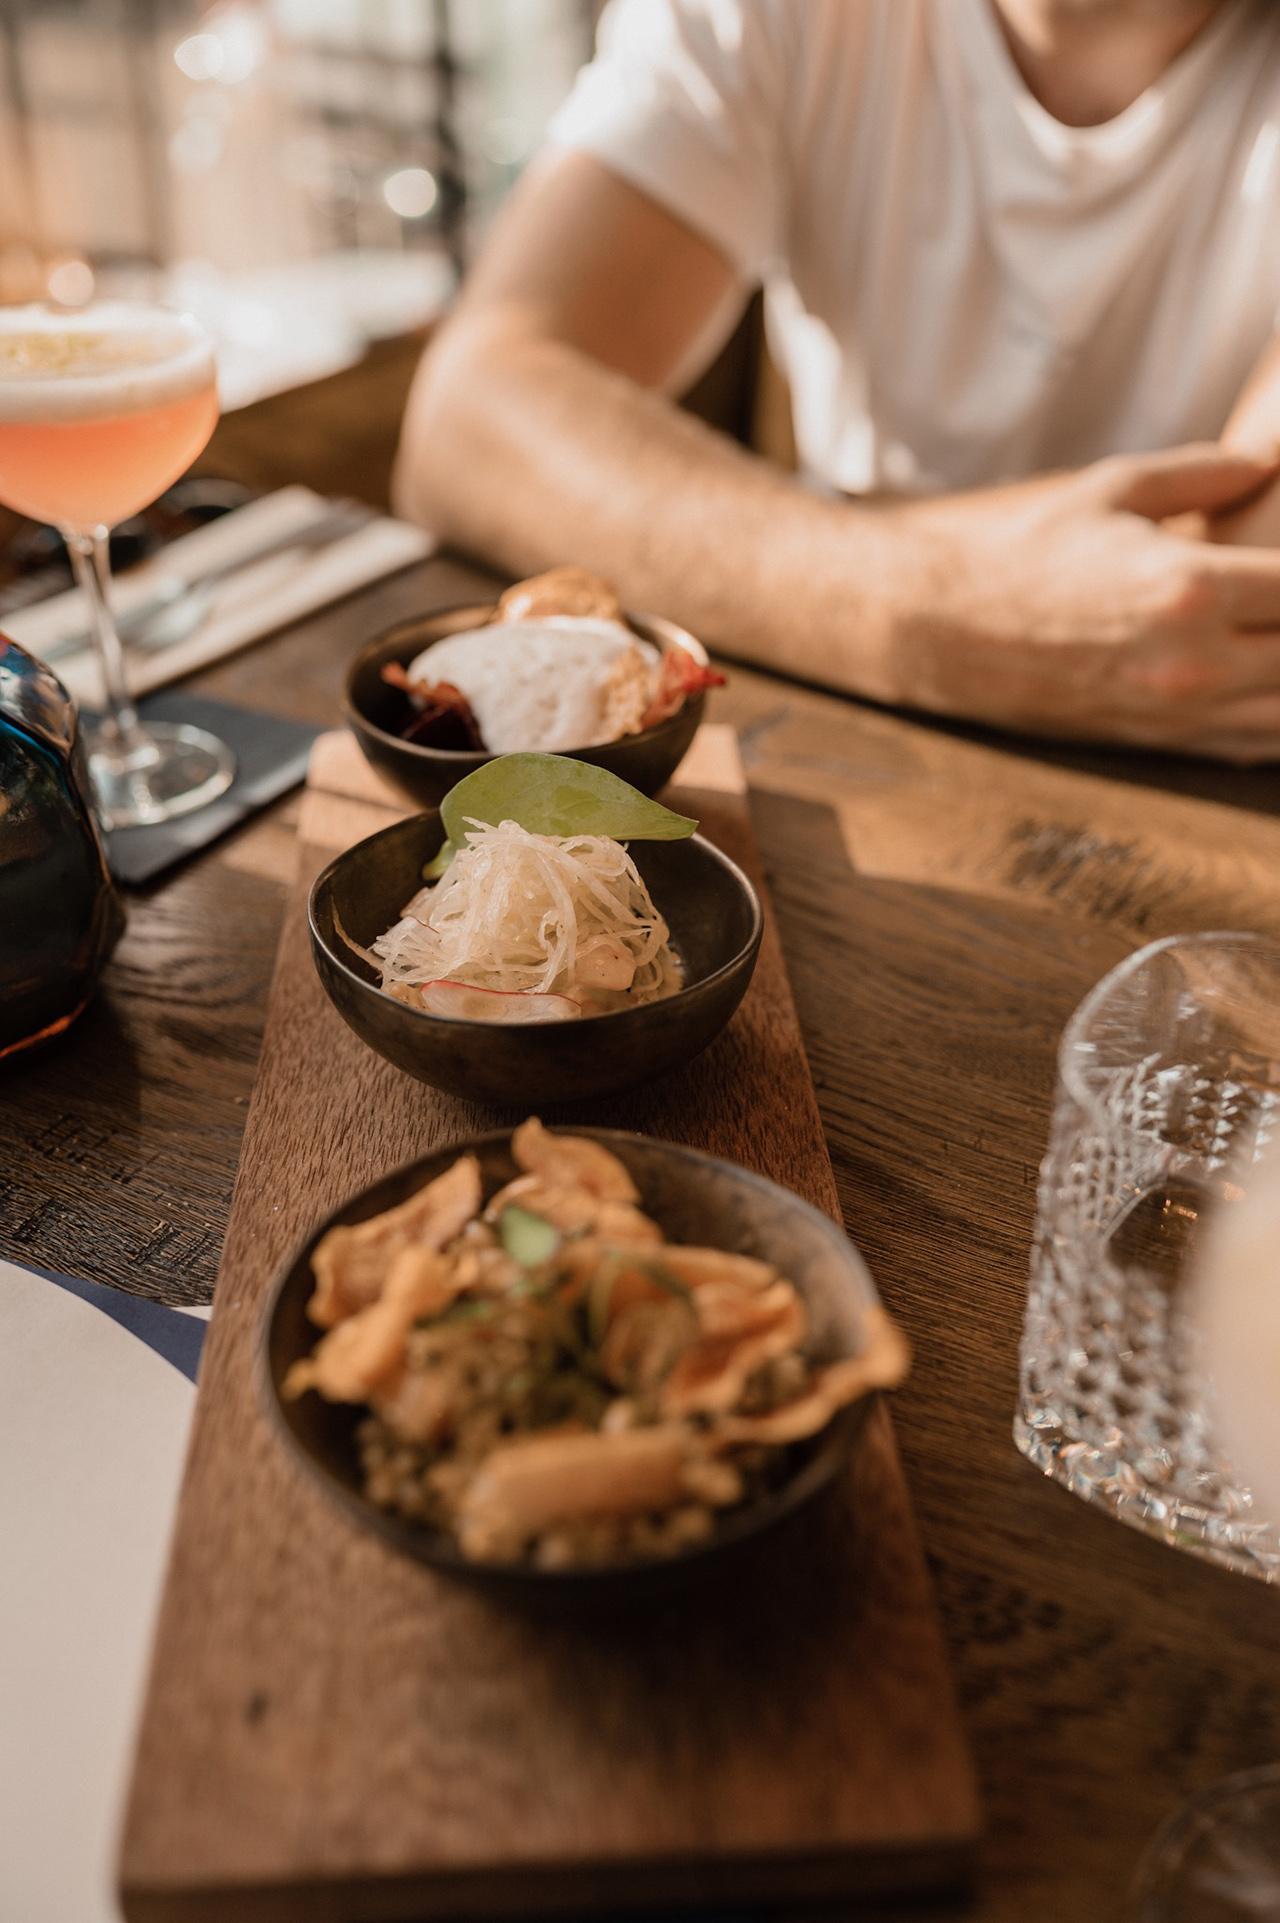 noon-maastricht-interior-restaurant-food-shared-dining